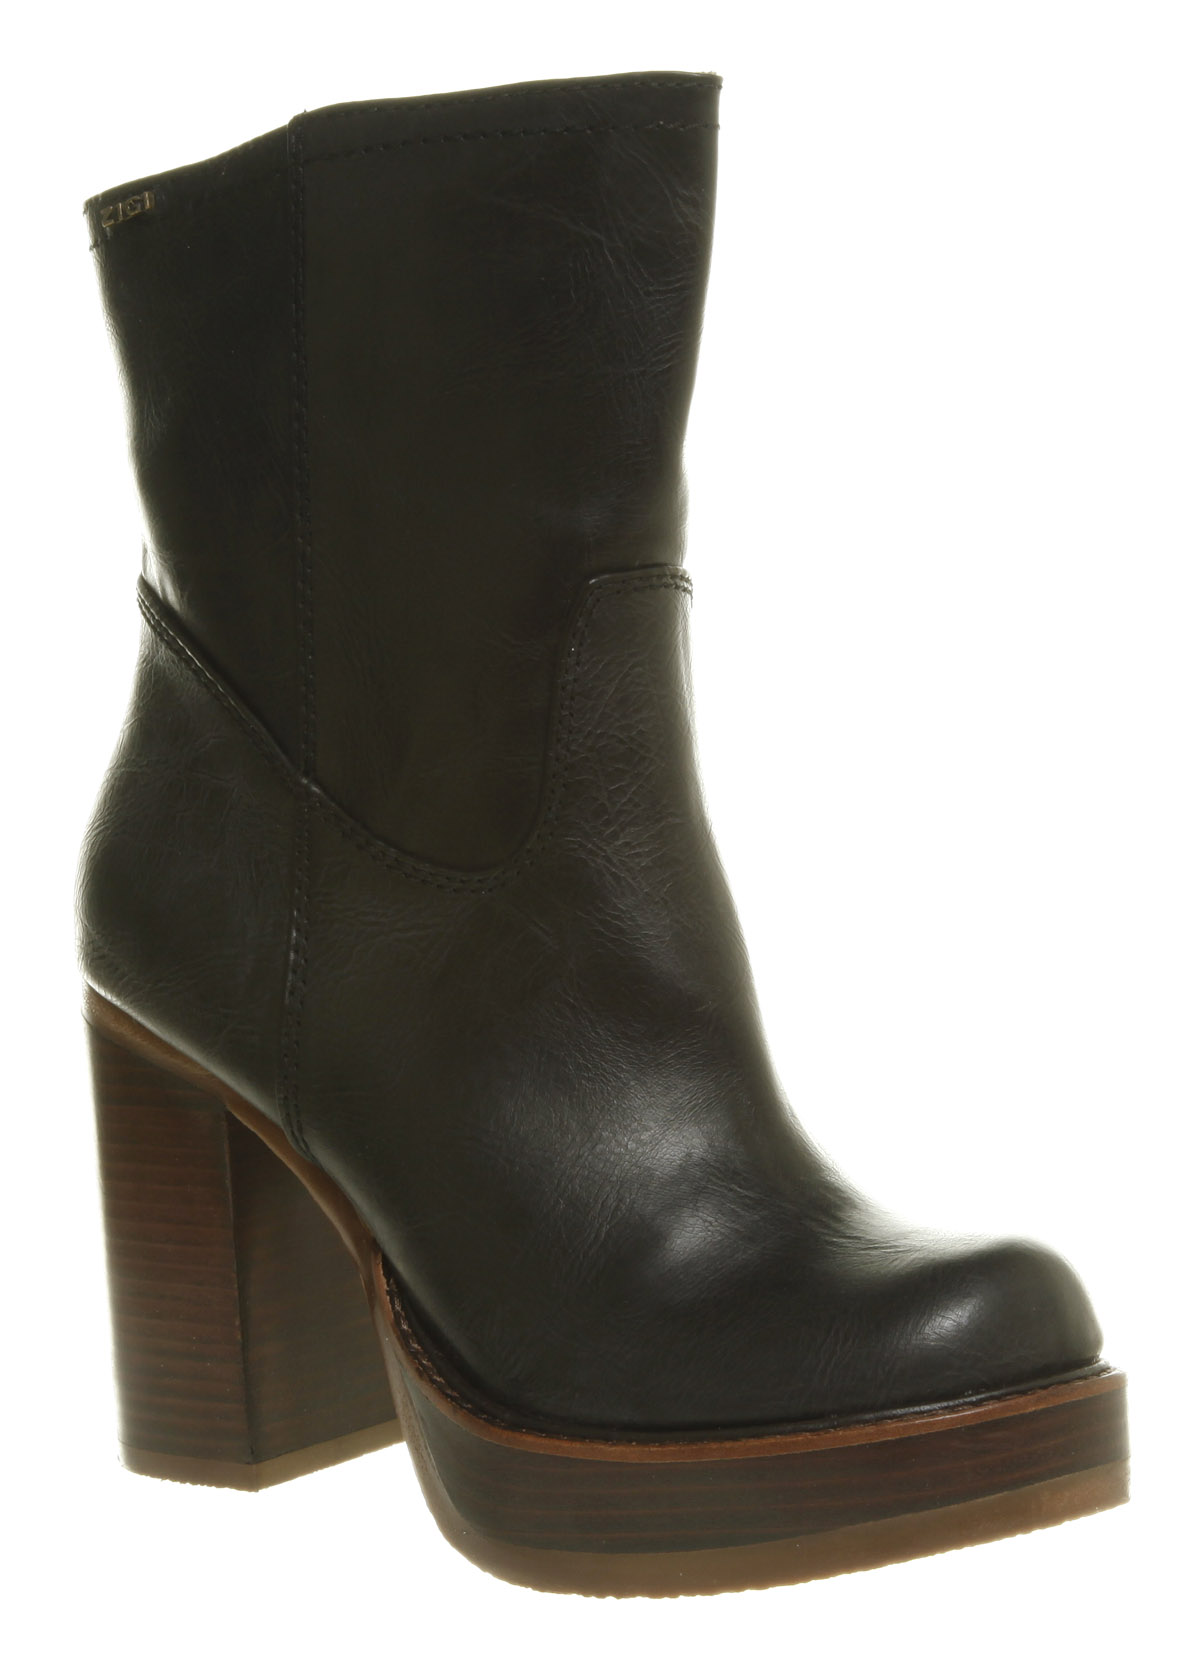 Black Chunky Heels Platform Ankle Boots